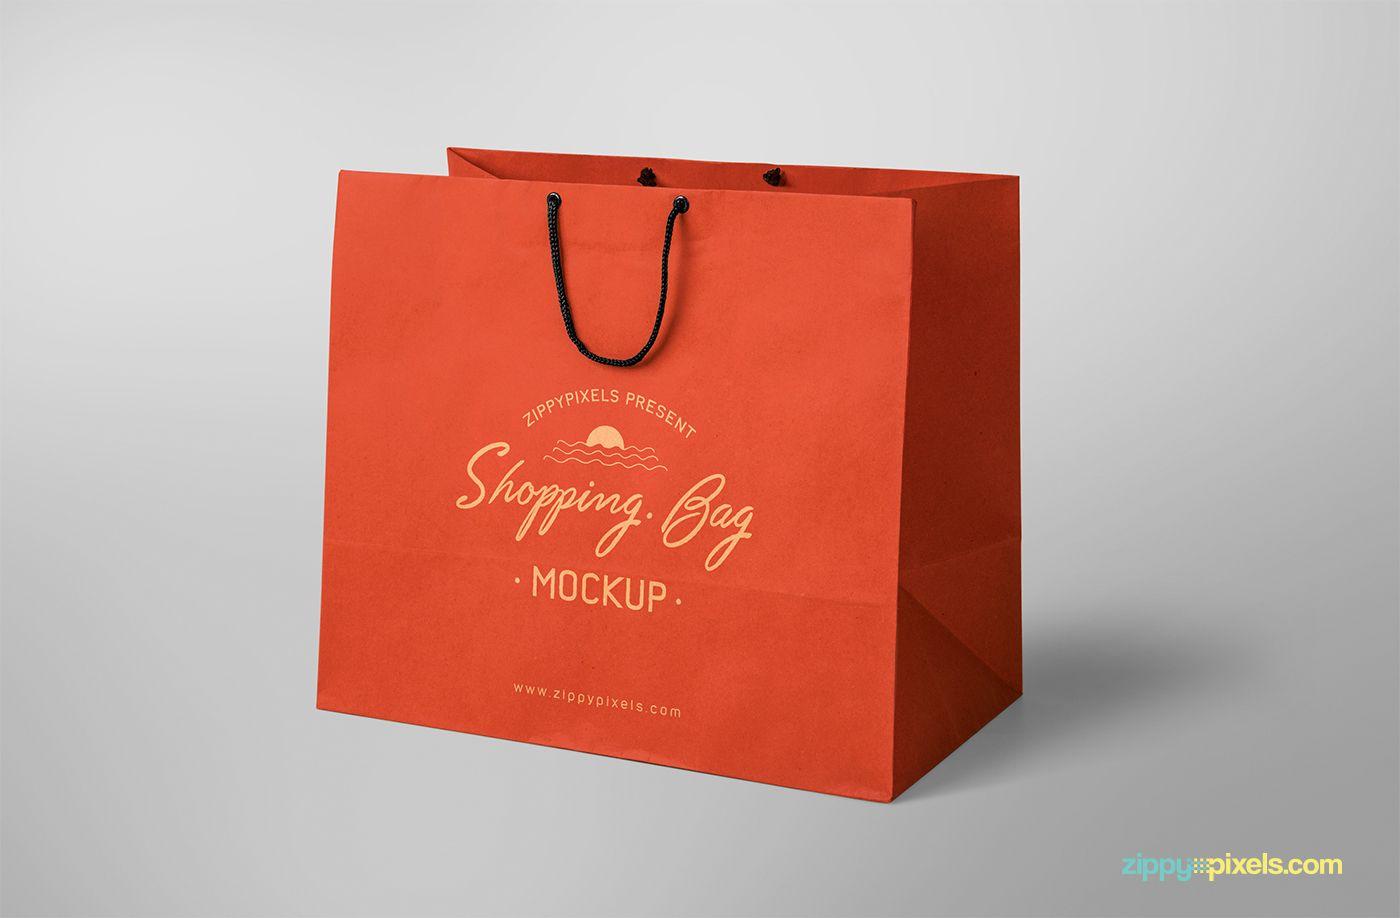 Download Free Shopping Bag Mockup On Behance Bag Mockup Shopping Bag Design Free Packaging Mockup